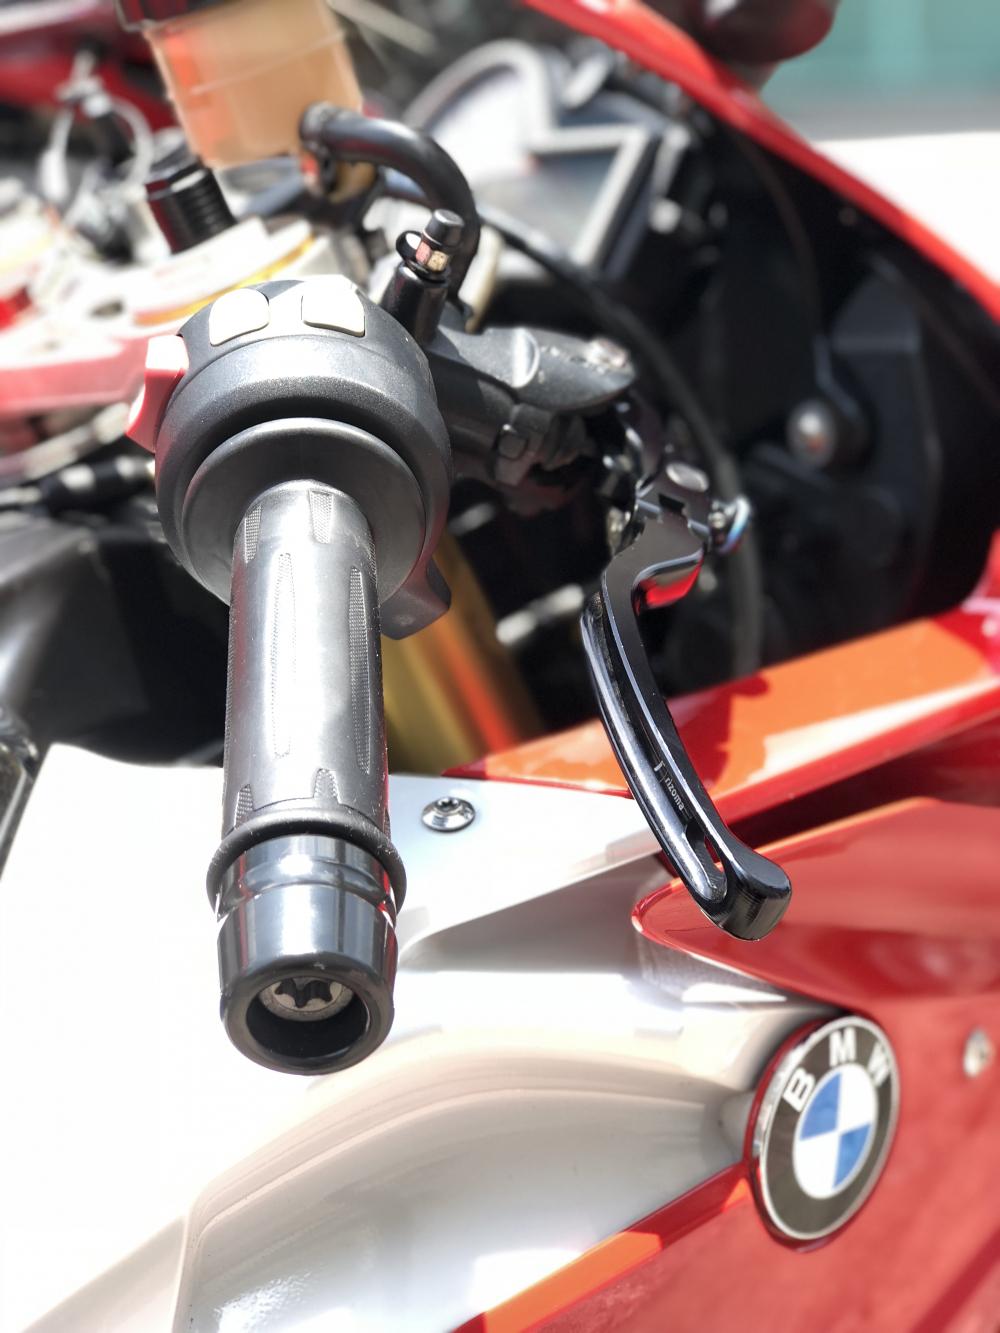 __Can Ban BMW S1000RR biet danh ca map mat le ABS Dang ky lan dau 1 2016 chau au - 4